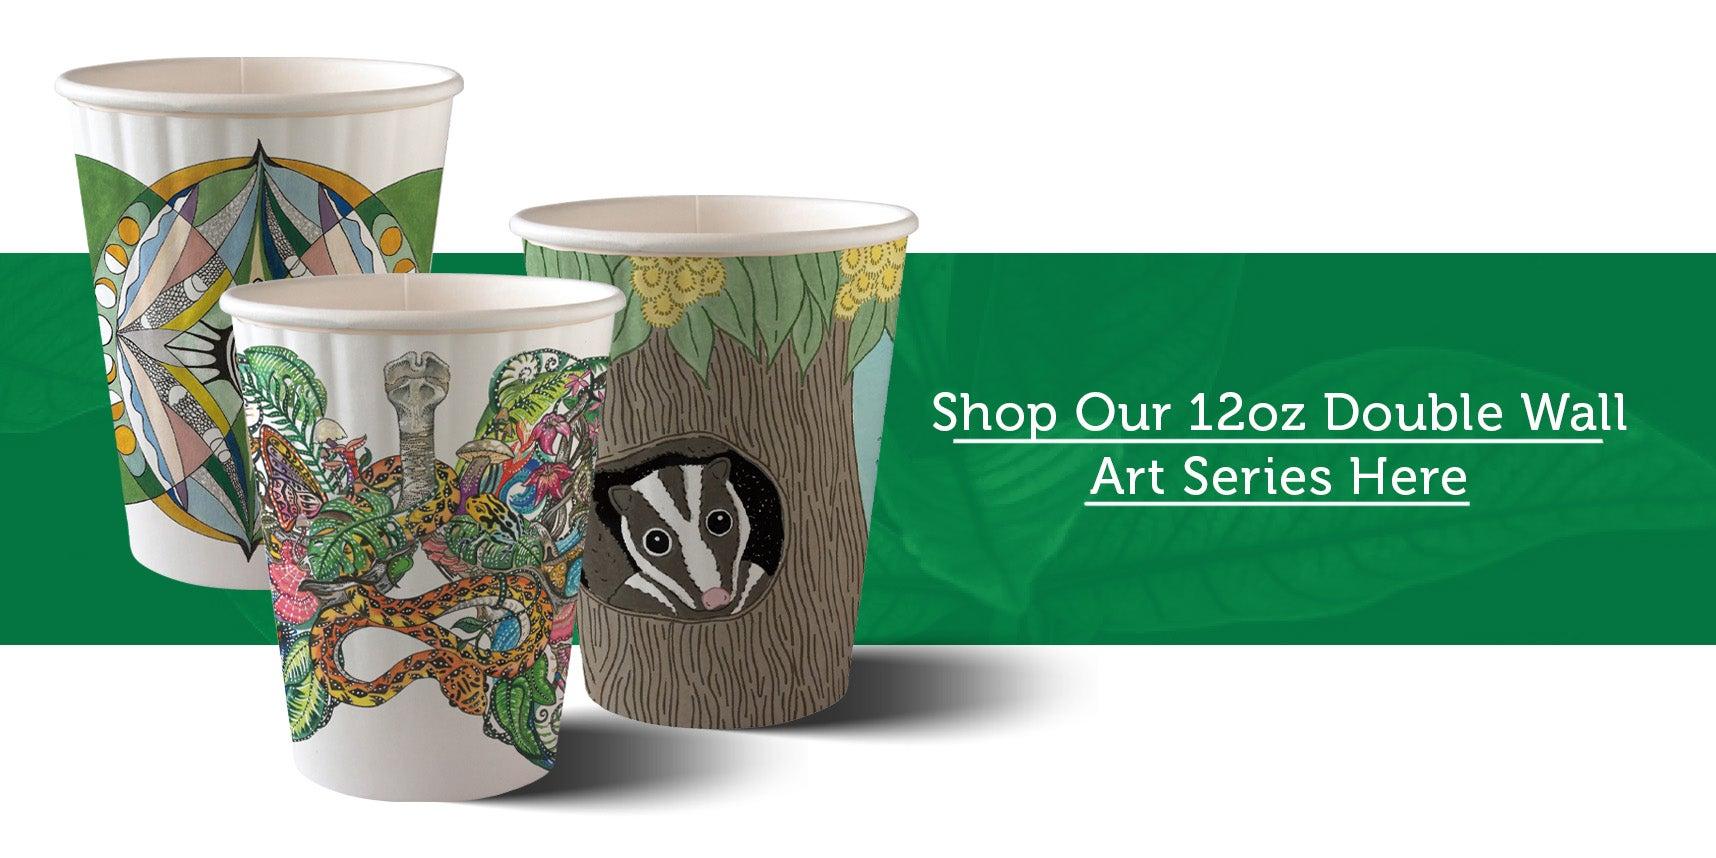 3 8oz single wall art series coffee cups